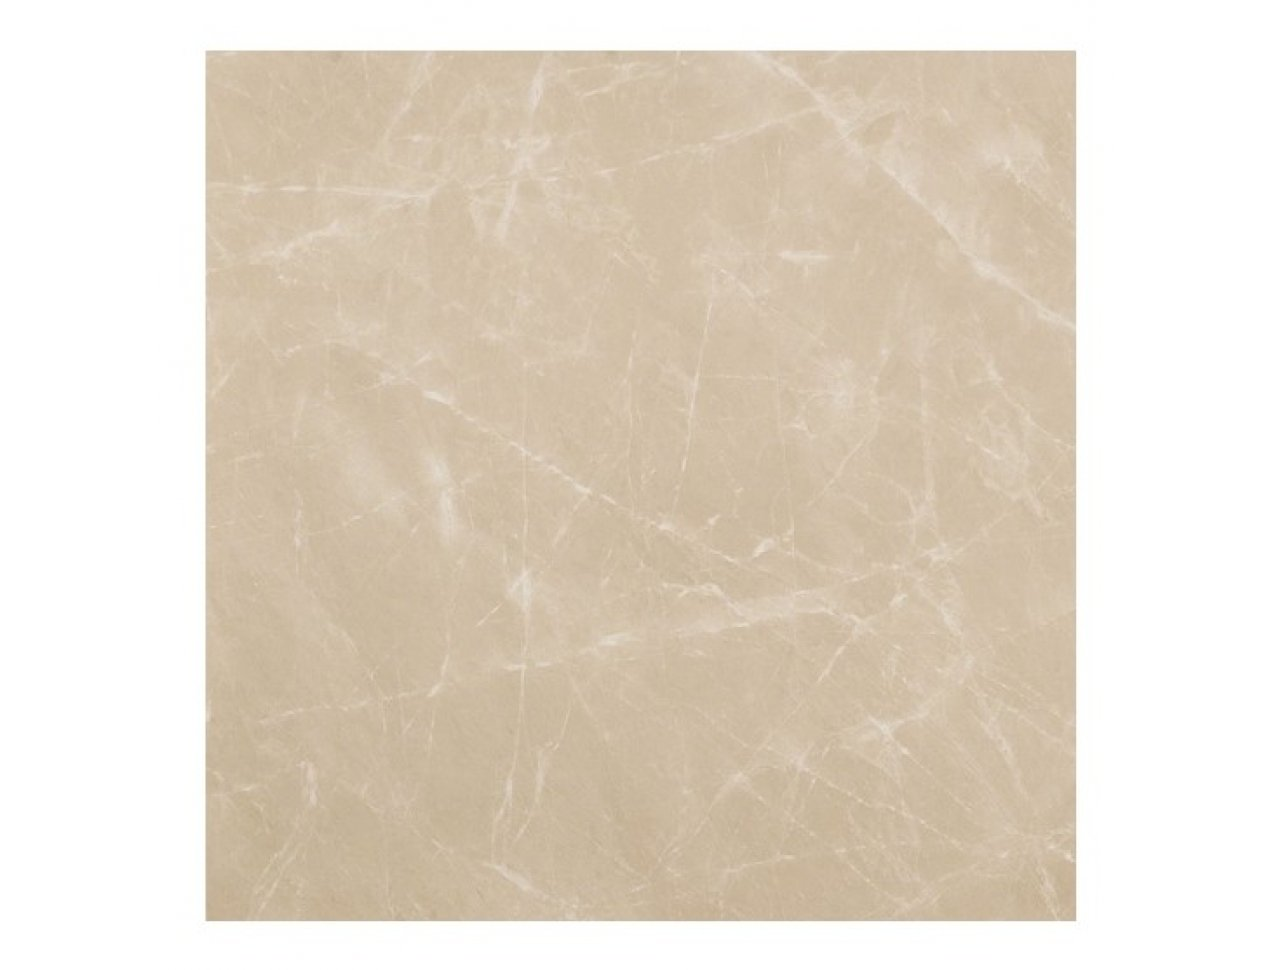 Напольная плитка FAP Roma Diamond Beige Duna Brillante 60 x 60 см, Арт. fNEQ